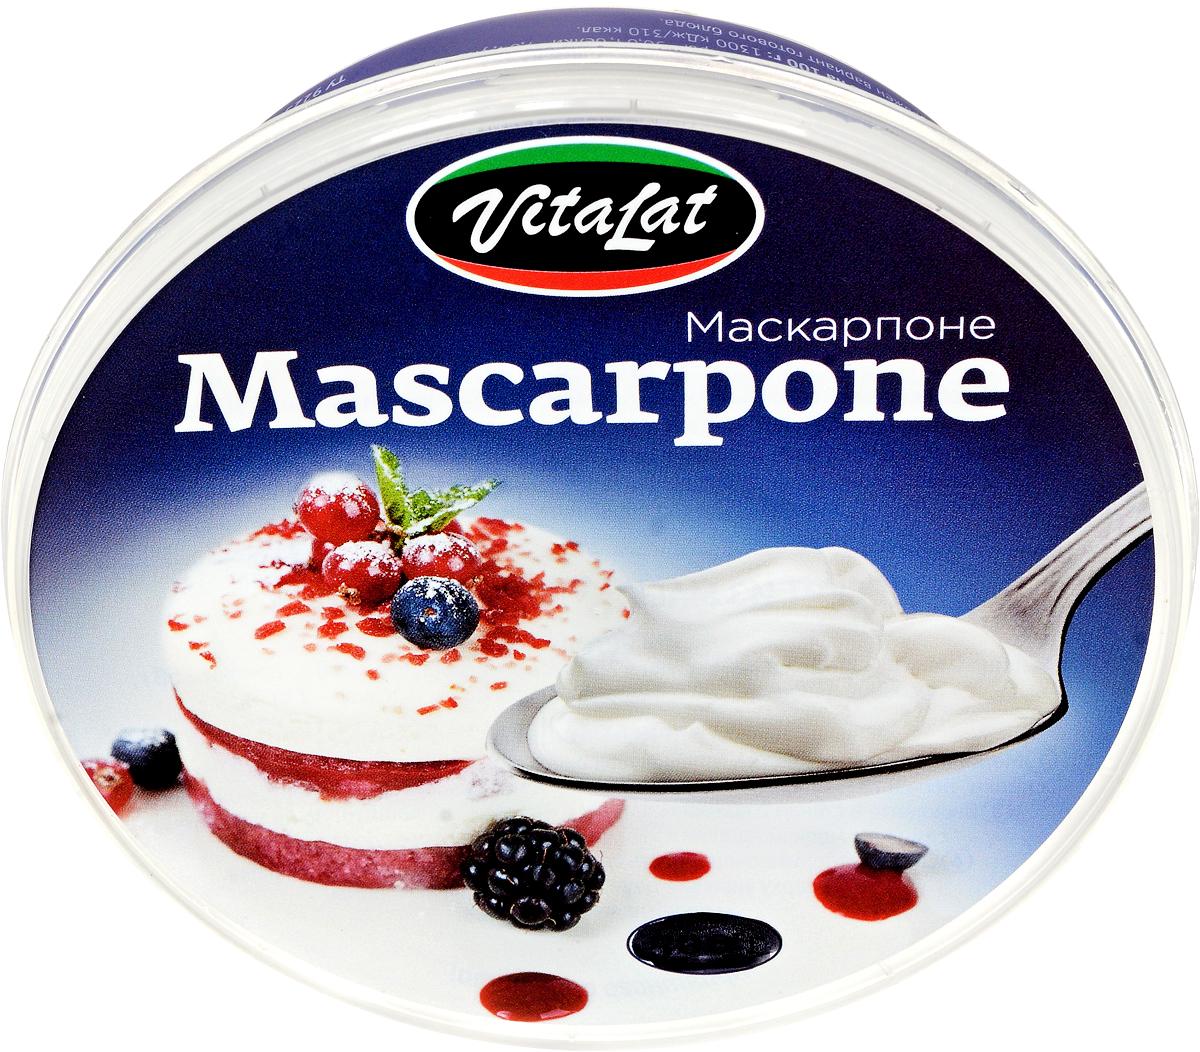 Vitalat Сыр Маскарпоне, 80%, 250 г galbani сыр маскарпоне 80% 250 г